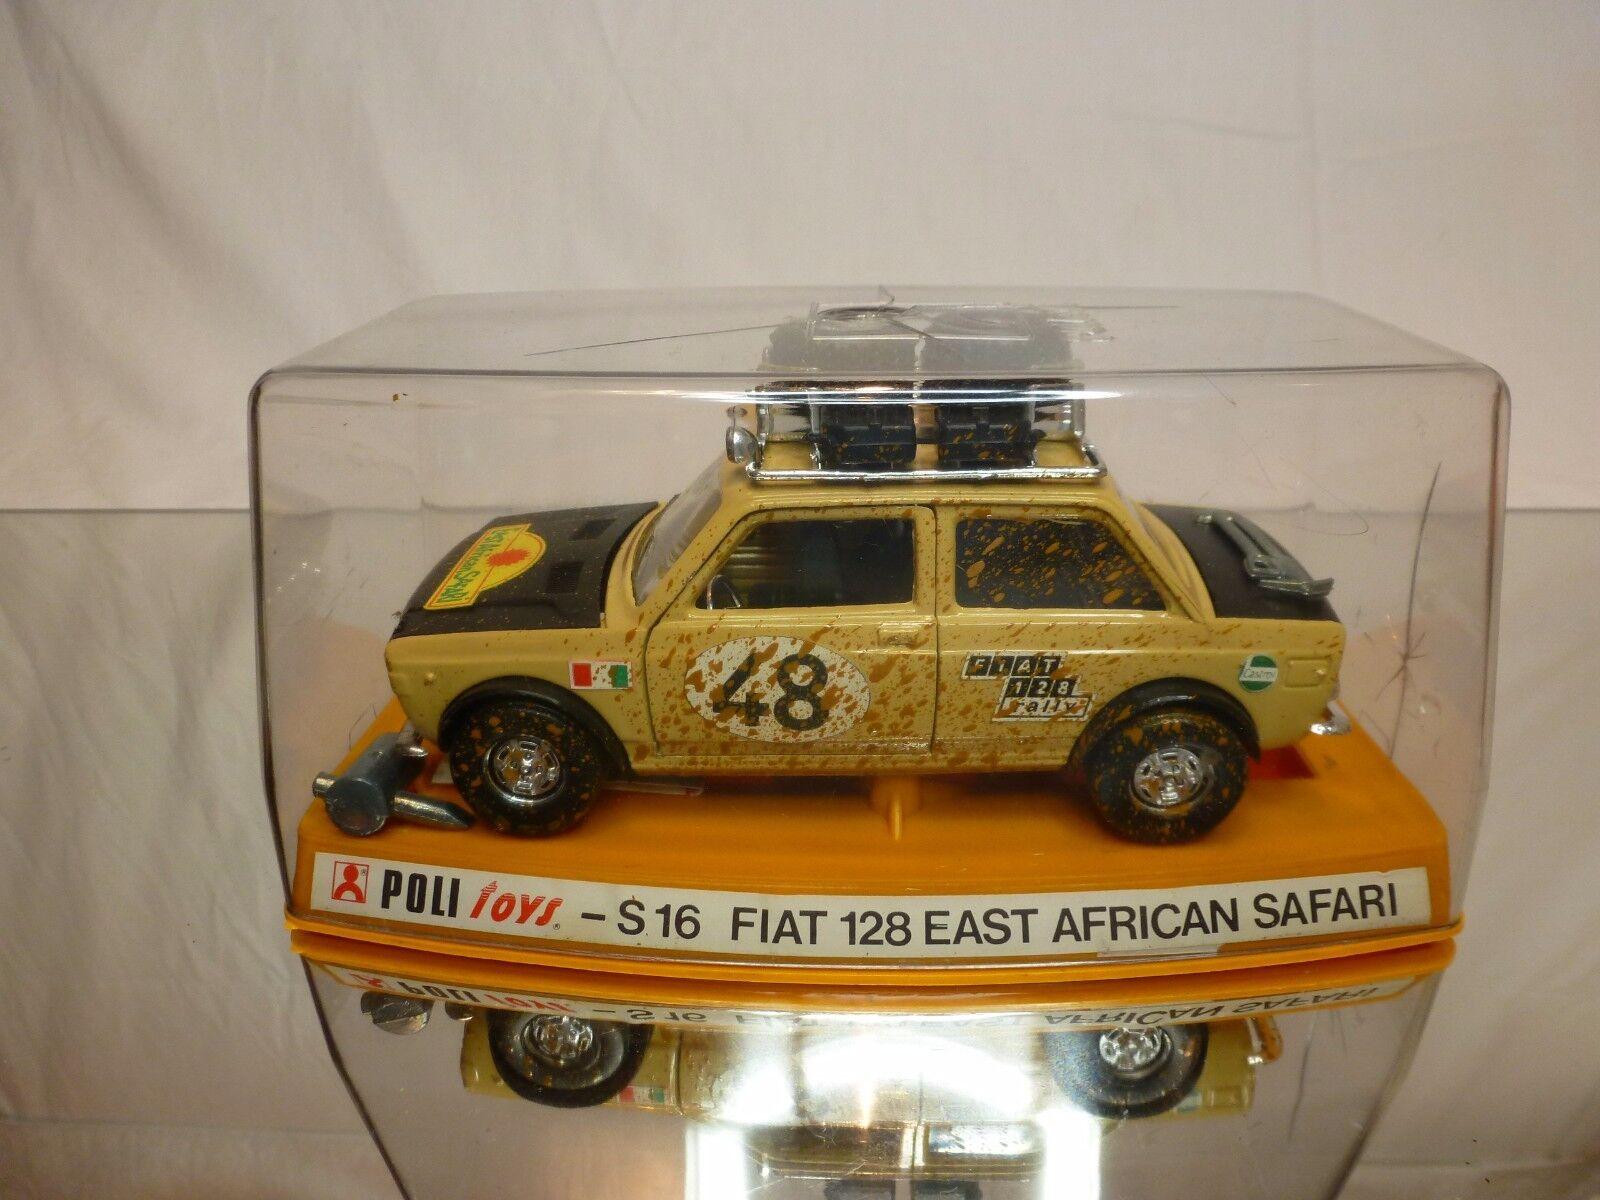 POLITOYS S16 FIAT 128  EAST AFRICAN SAFARI- SAHARA BEIGE 1 25 - EXCELLENT IN BOX  vente discount en ligne bas prix